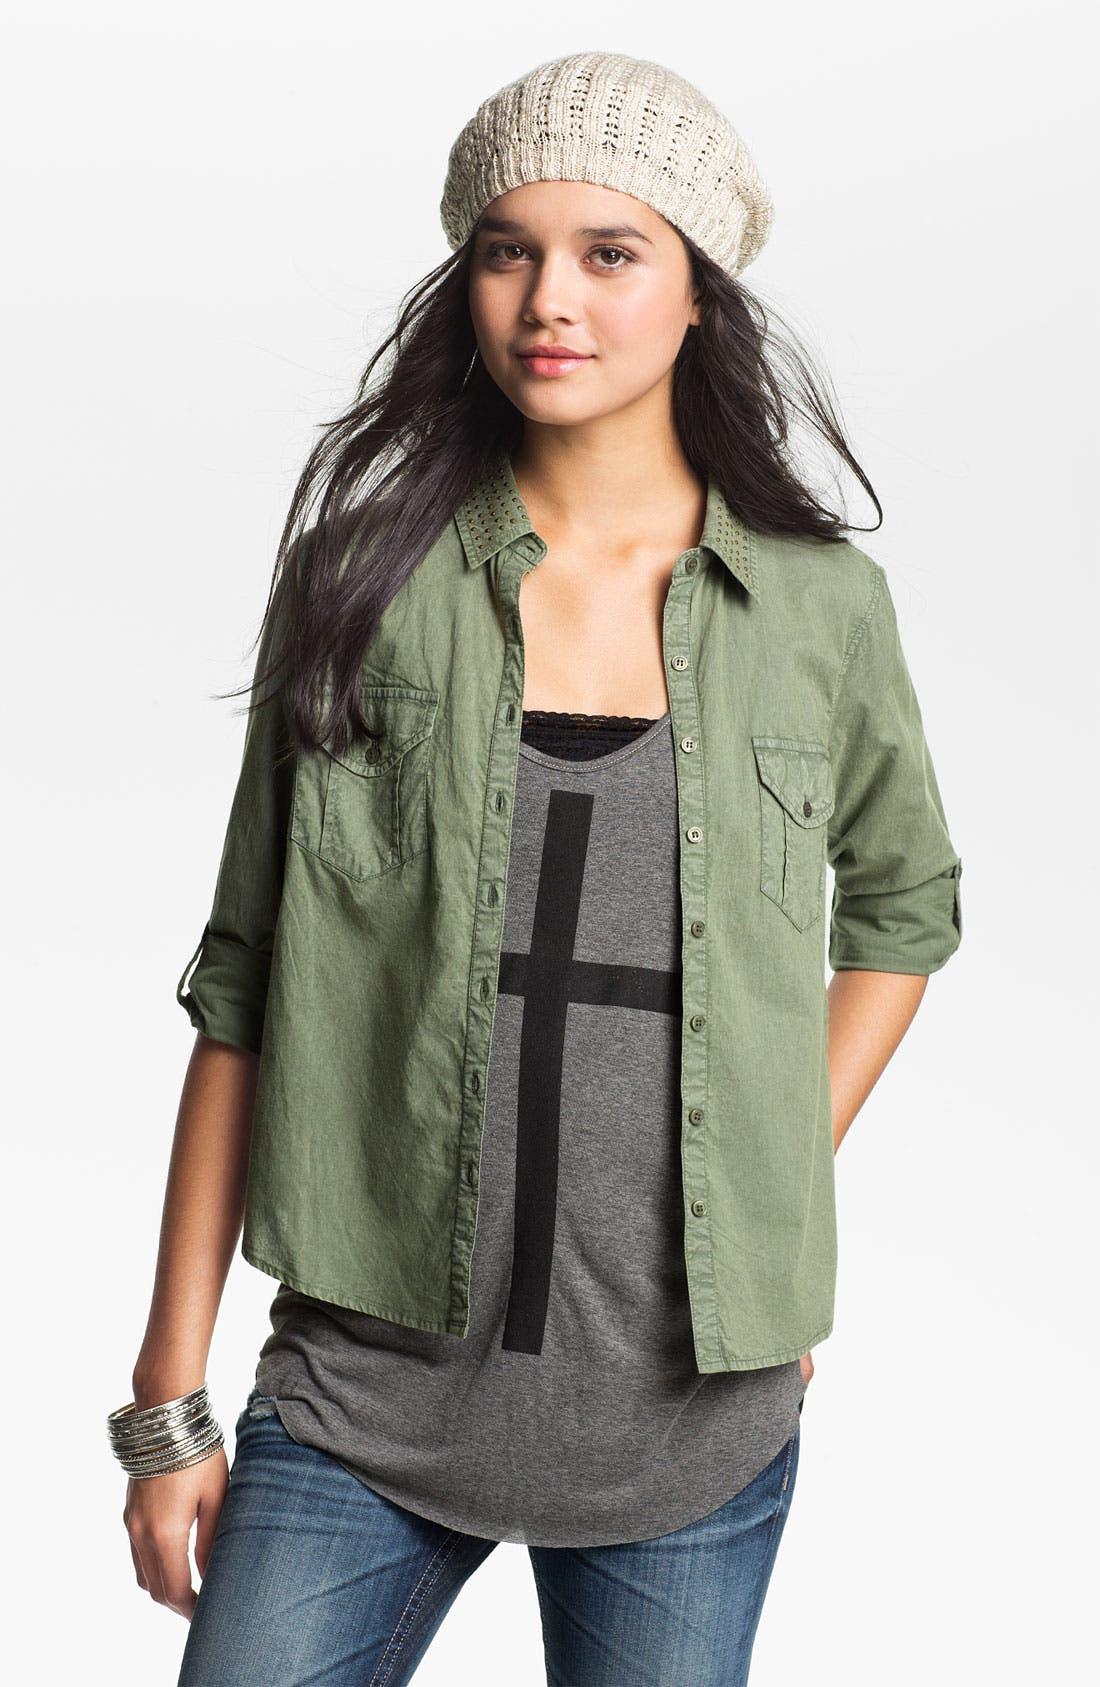 Alternate Image 1 Selected - Fire Stud Collar Army Shirt (Juniors)